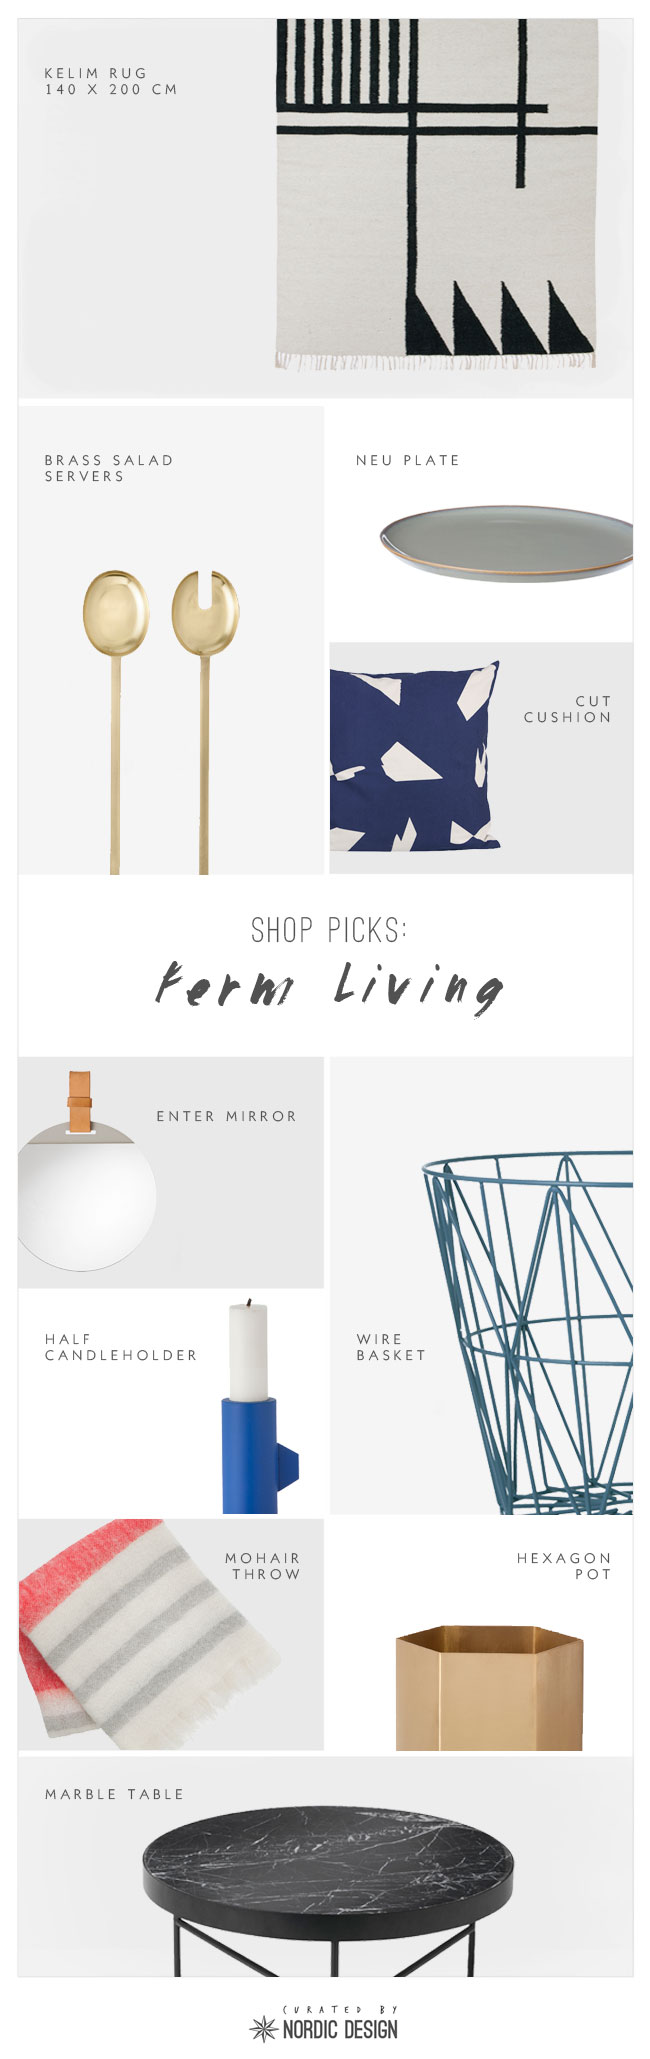 Shop-picks-Ferm-Living-by-Nordic-Design